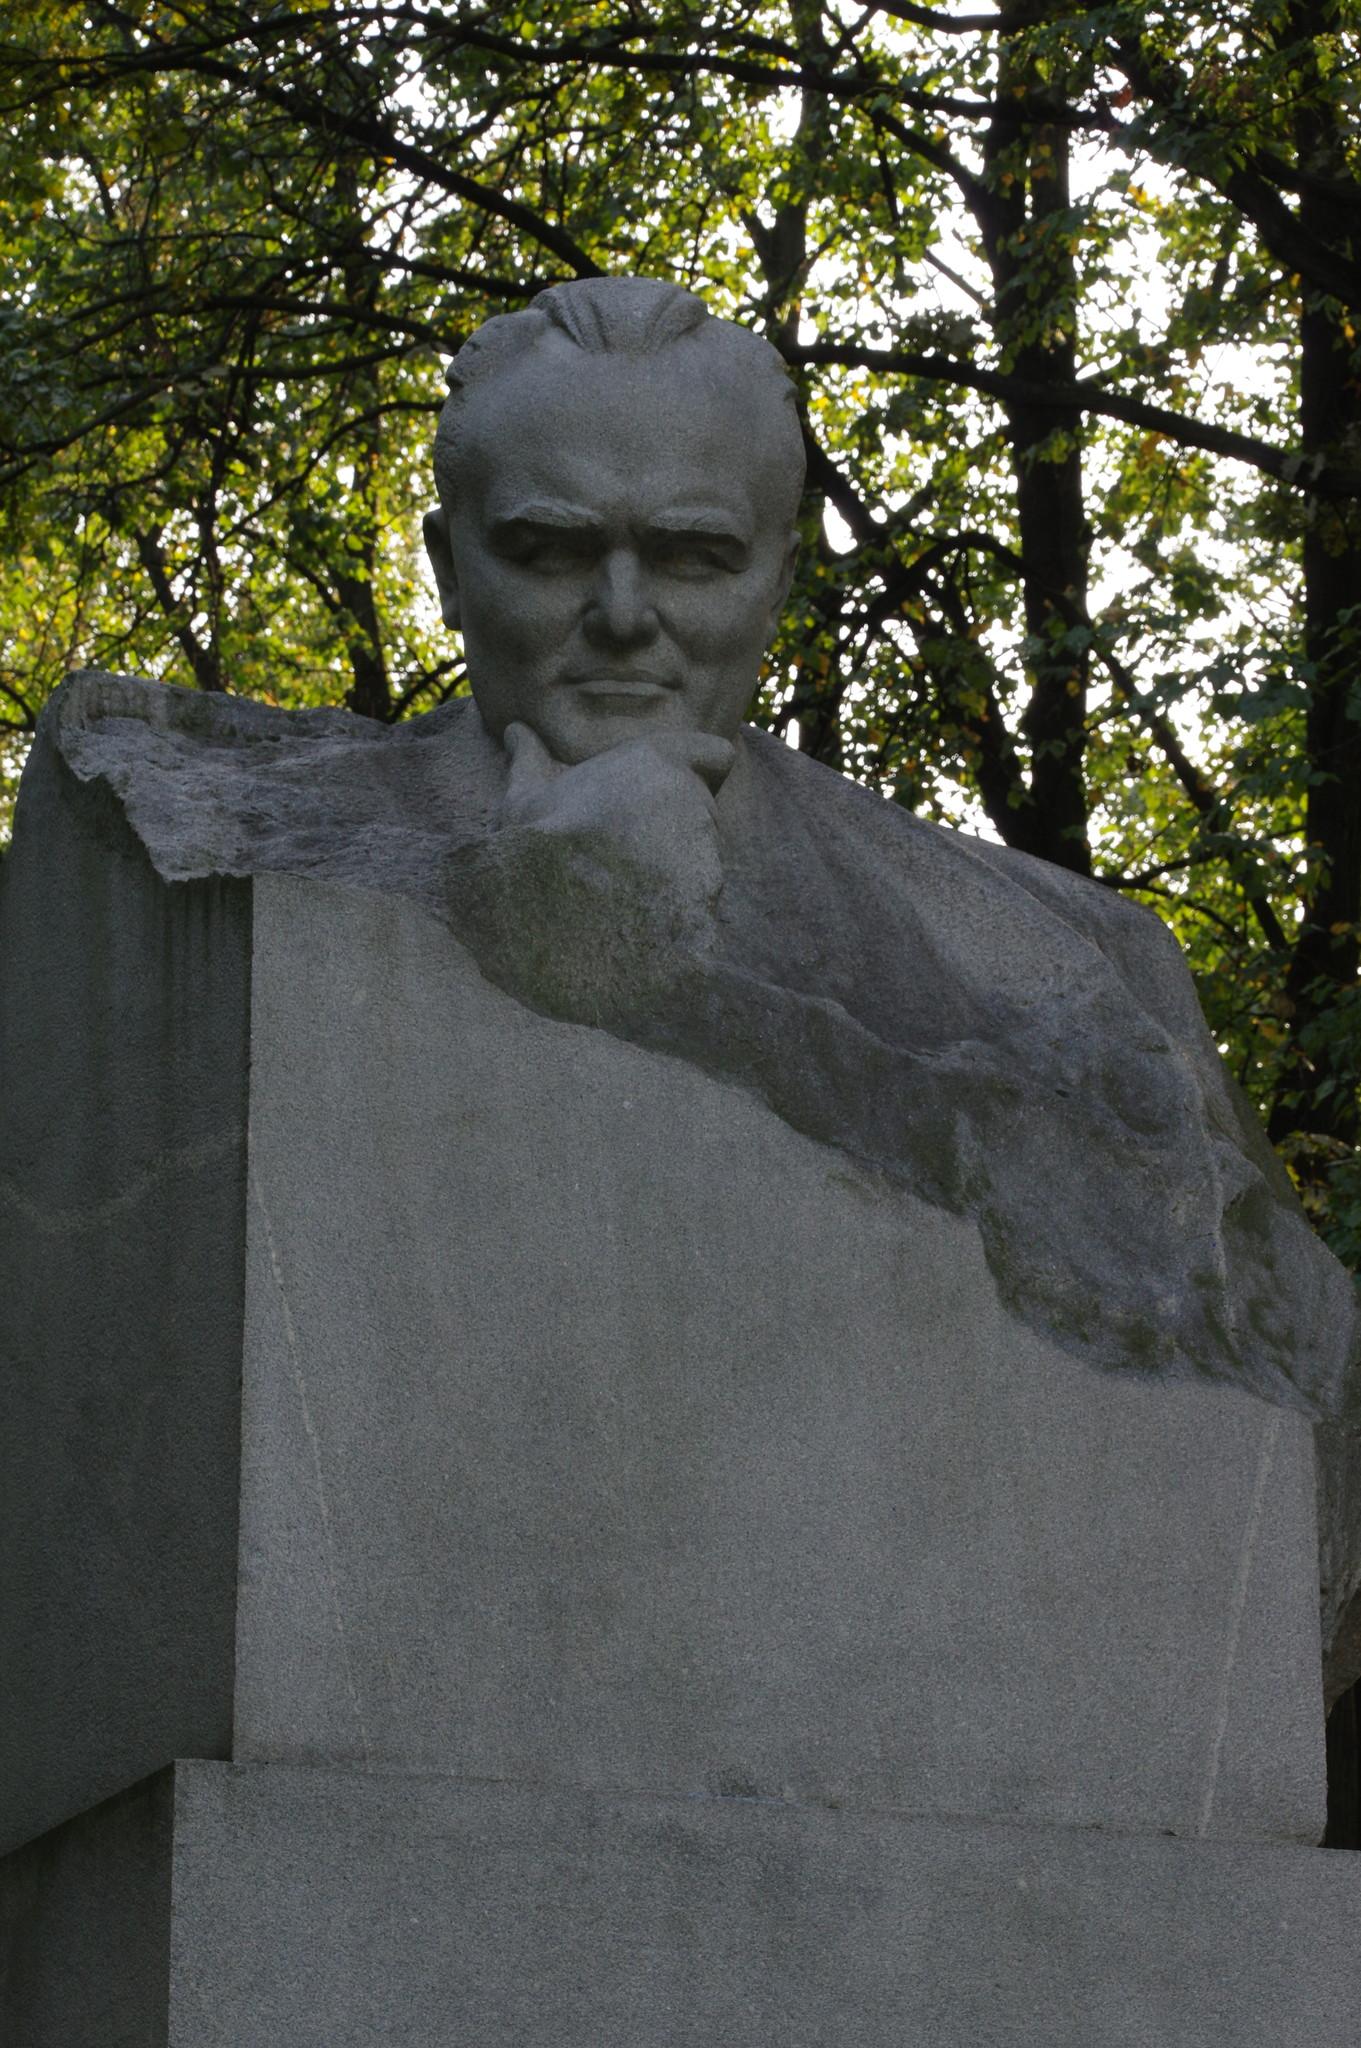 Бюст Сергея Королёва во дворе перед Мемориальным домом-музеем академика С.П. Королёва